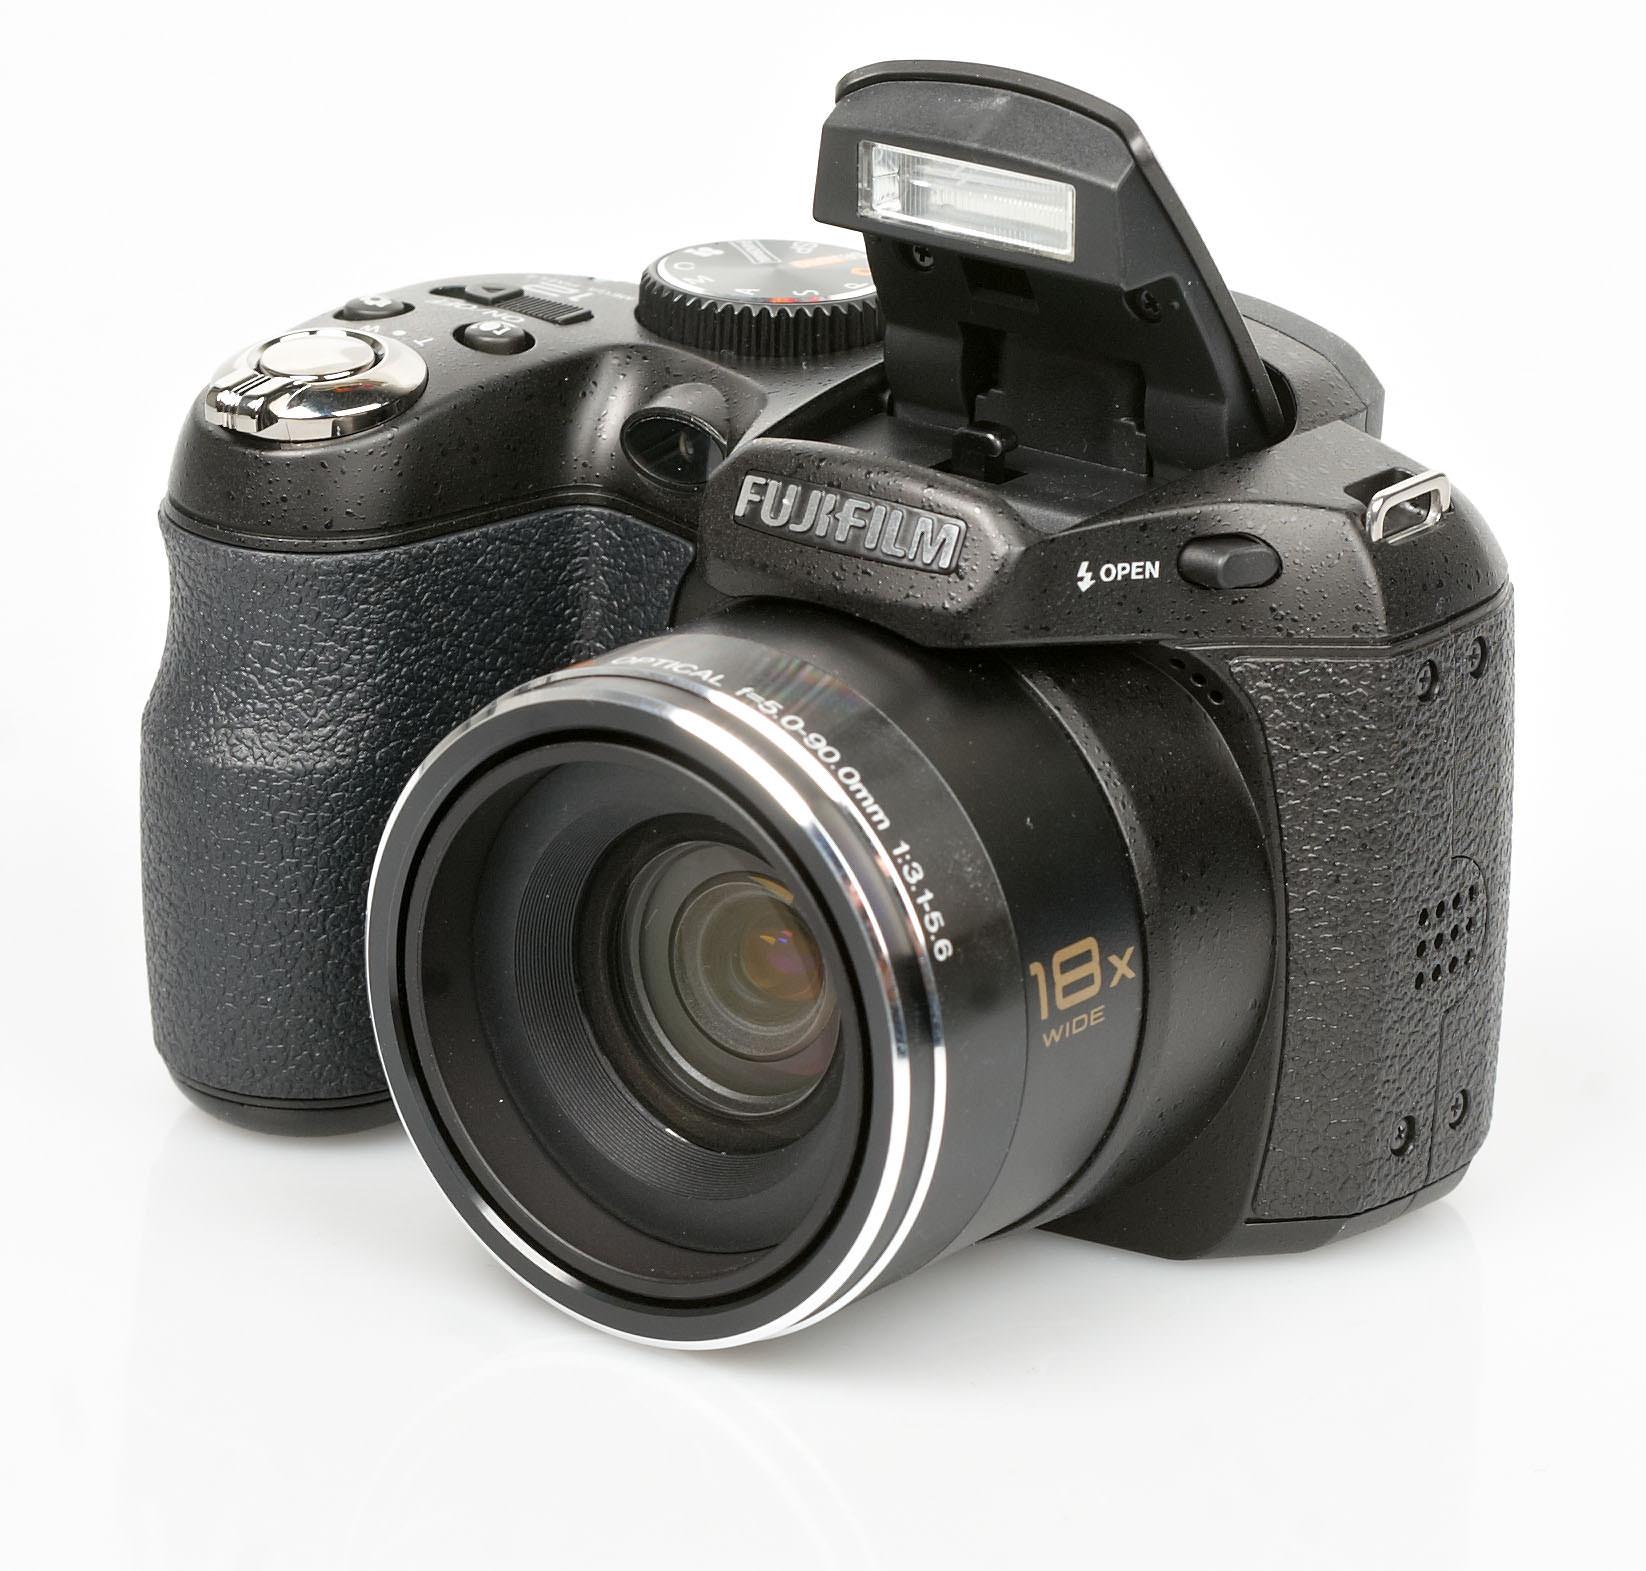 fujifilm finepix s2500hd digital camera review rh ephotozine com Fujifilm FinePix S3200 Fujifilm FinePix S1